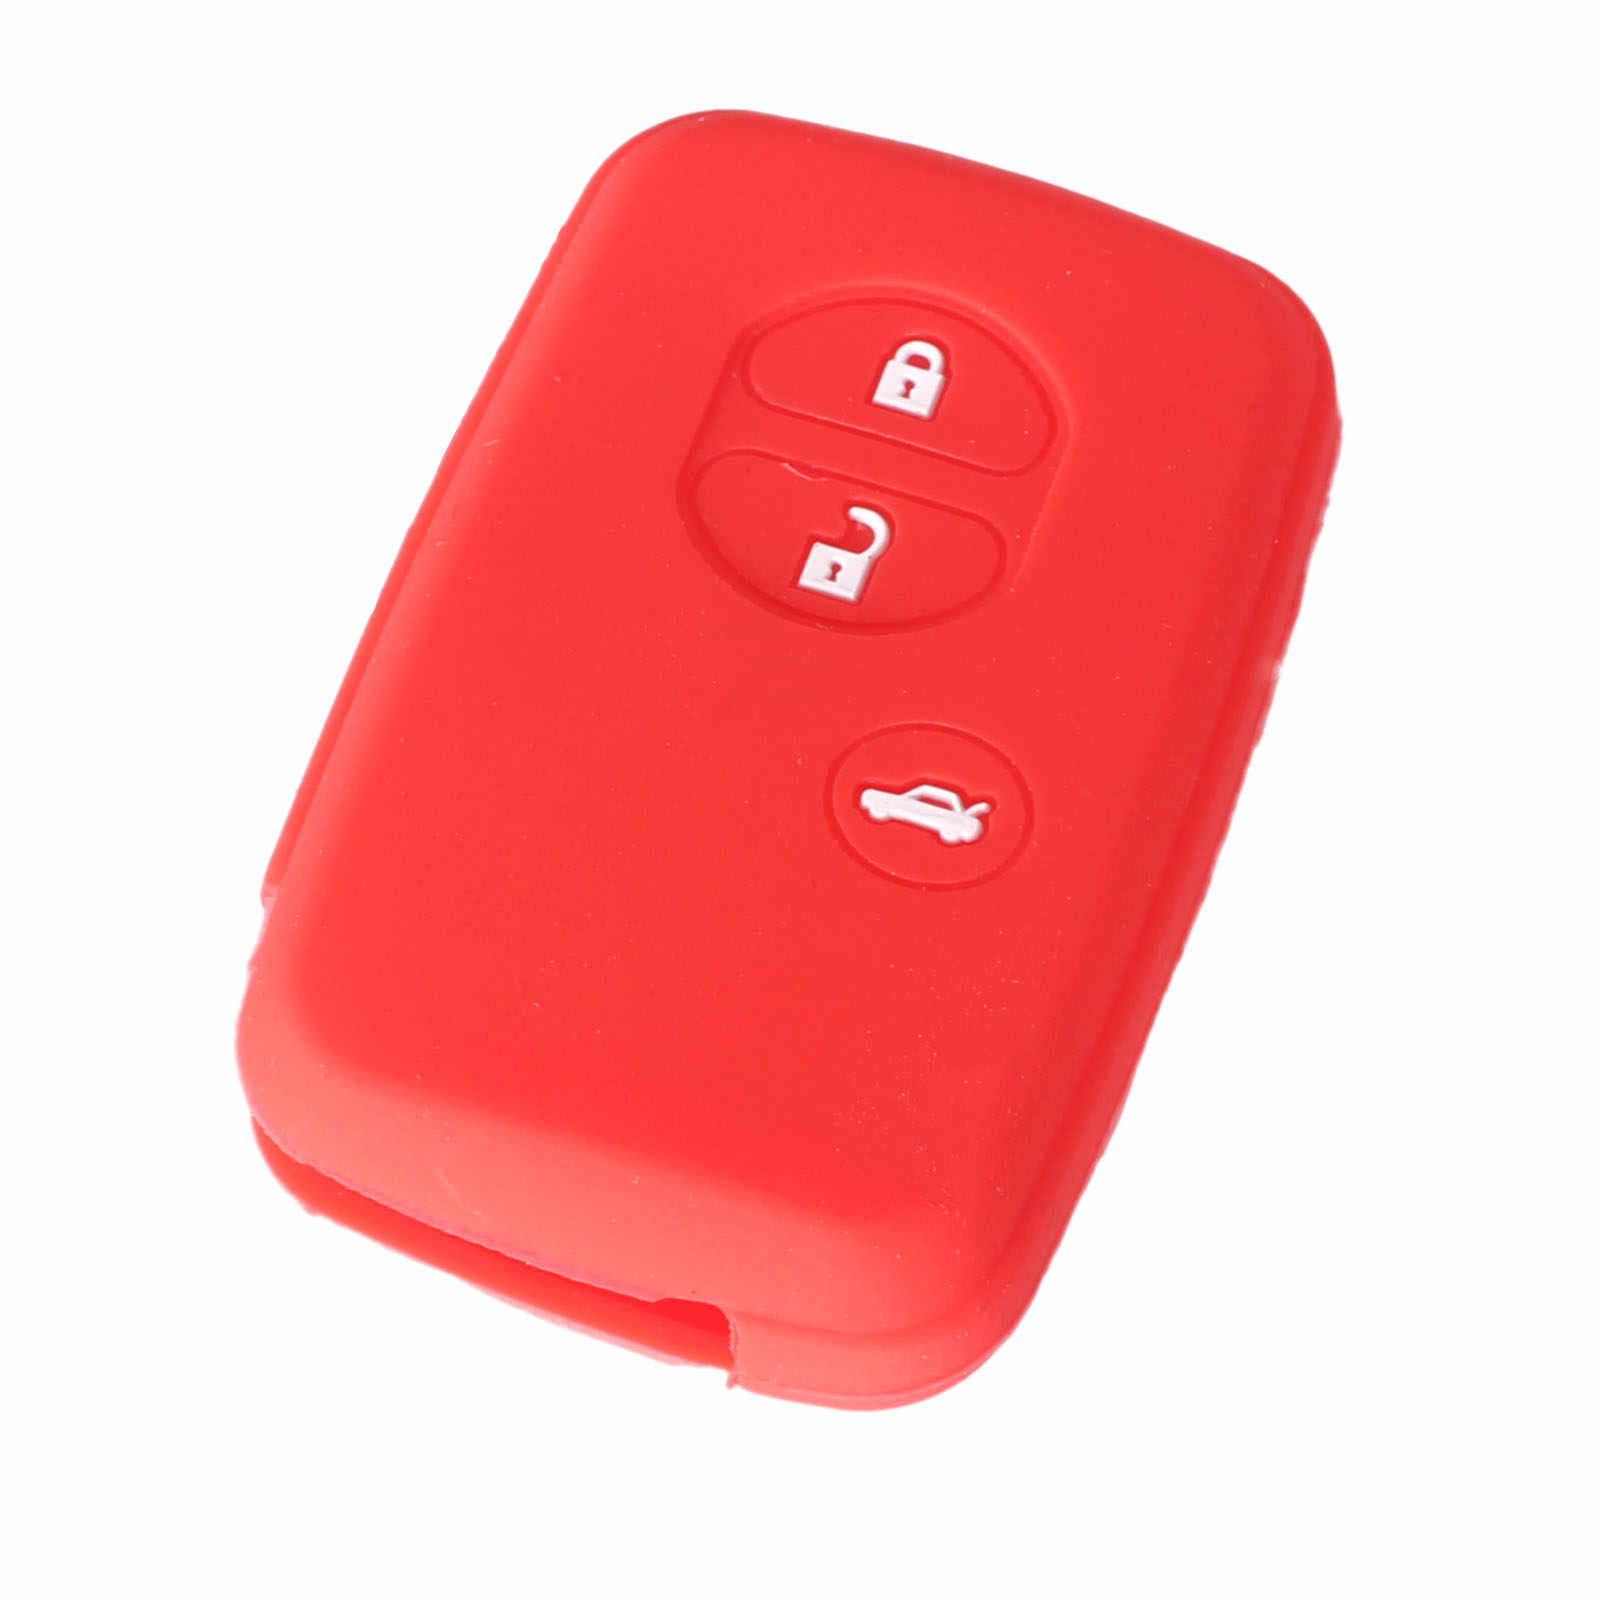 KEYYOU 3 Button Silicone Remote Key Cover For Toyota Land Cruiser Camry Highlander Crown Prado Prius Car Key Set Jacket Fob Case